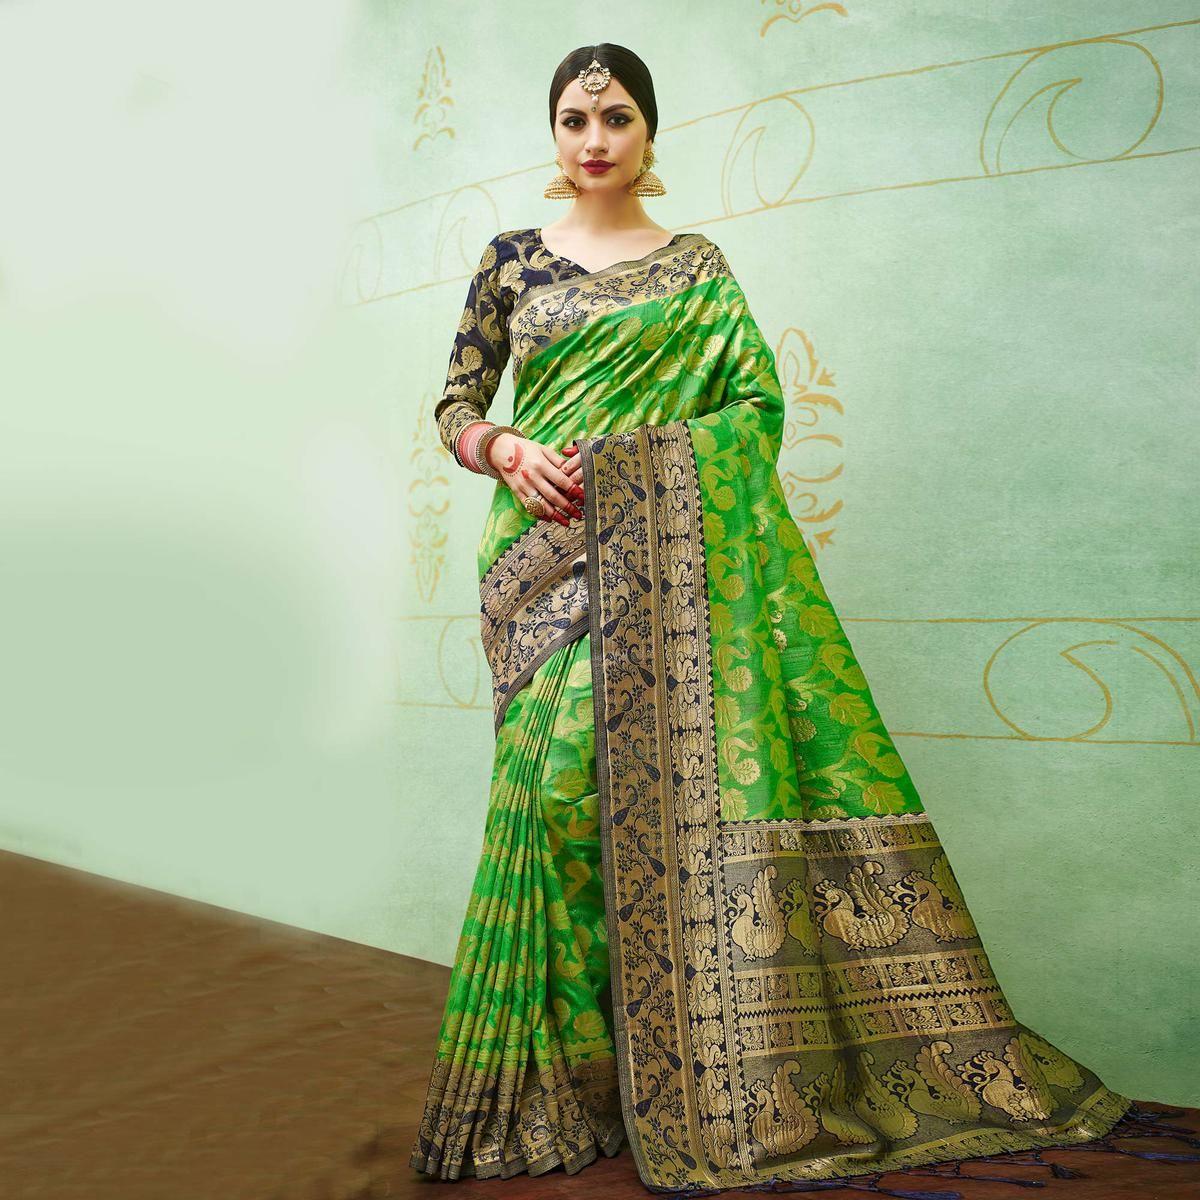 6327393e5a2d87 Buy Green-Blue Colored Designer Festive Wear Banarasi Silk Saree Online  India